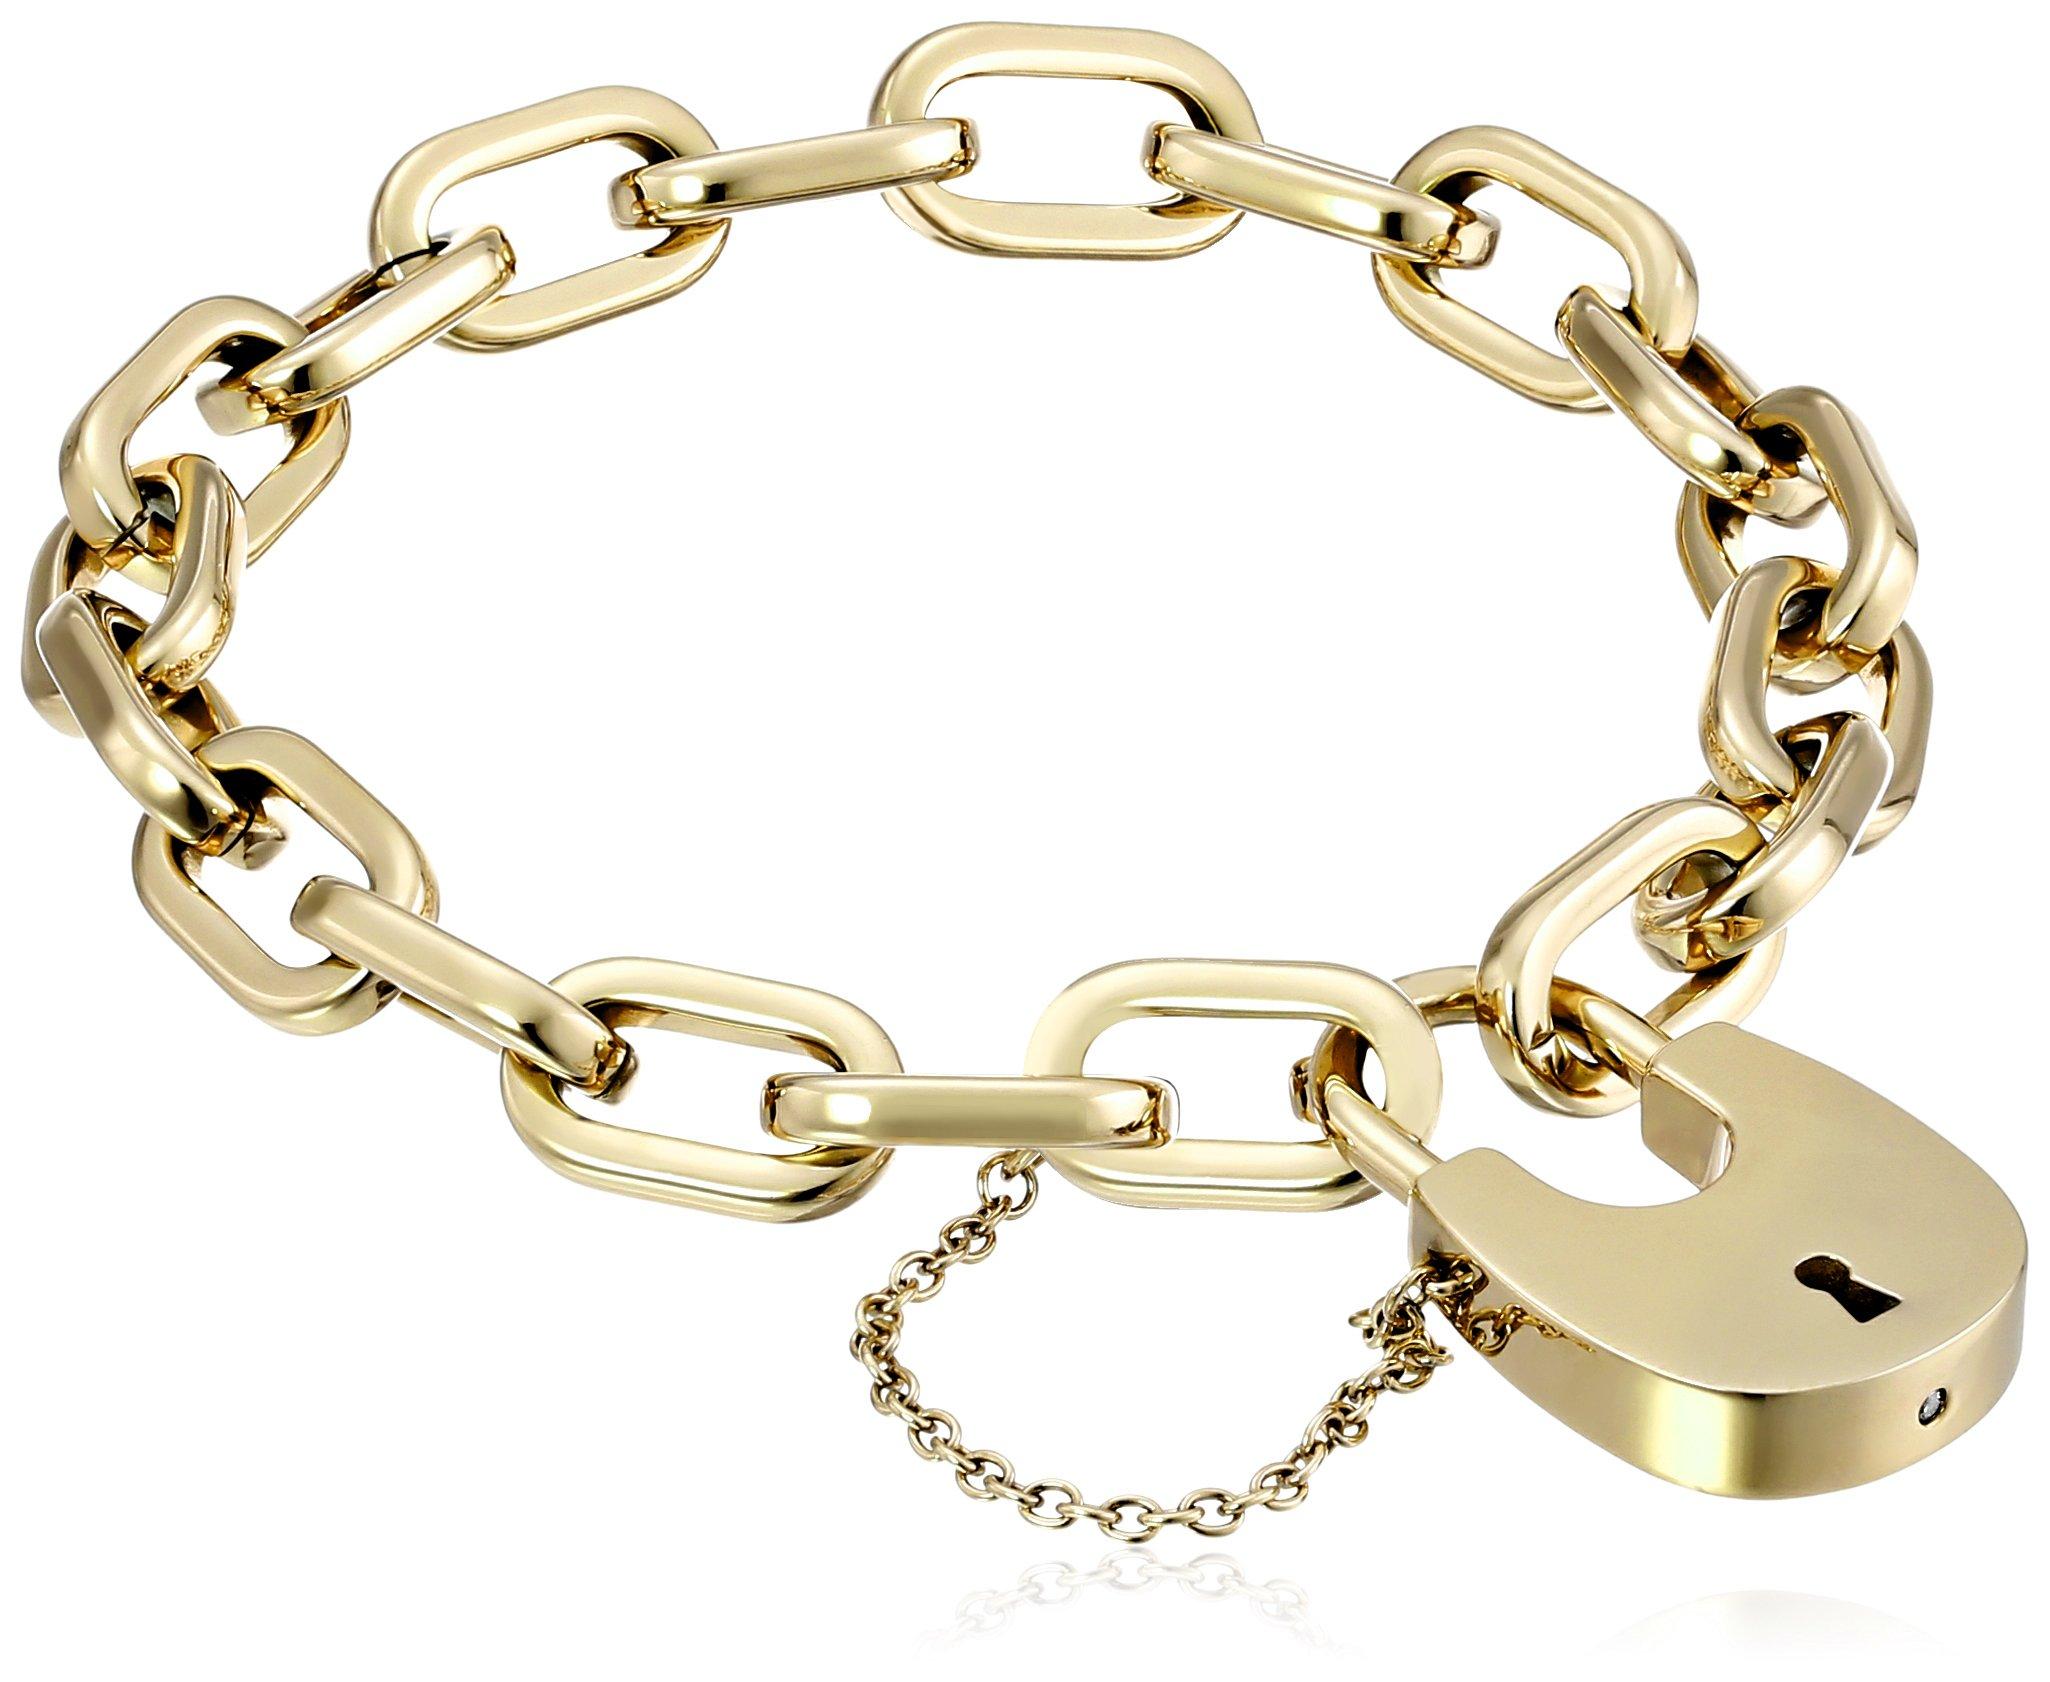 Michael Kors Gold-Tone Padlock Link Bracelet